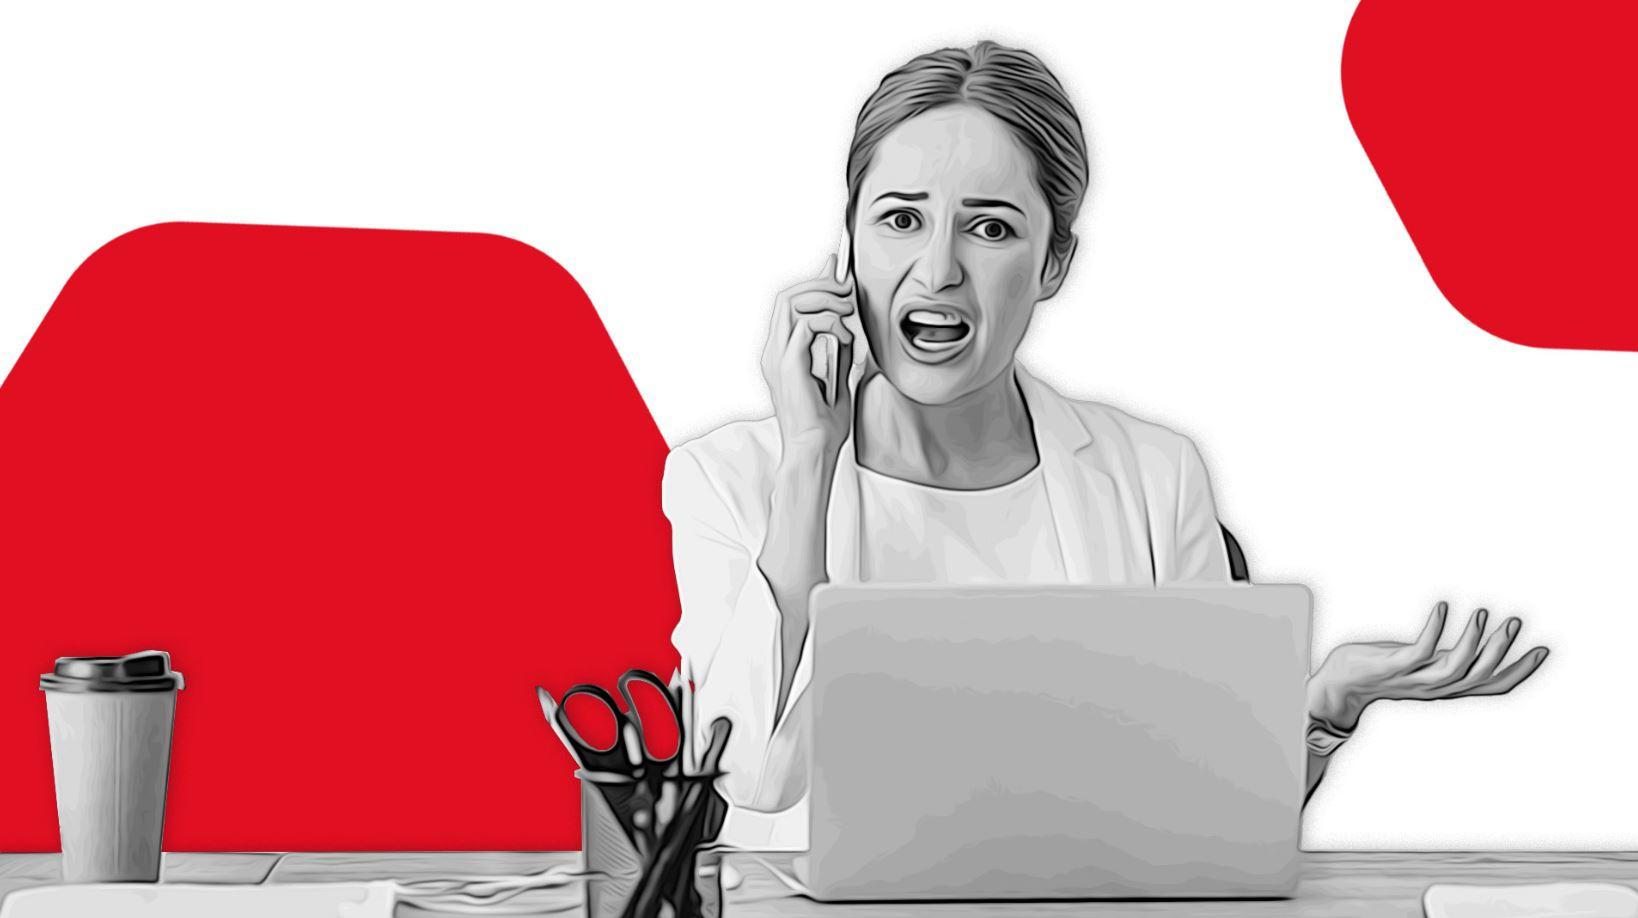 Hashtag Editor, CustomReactions e Mindful Meetings: i digital tool della settimana